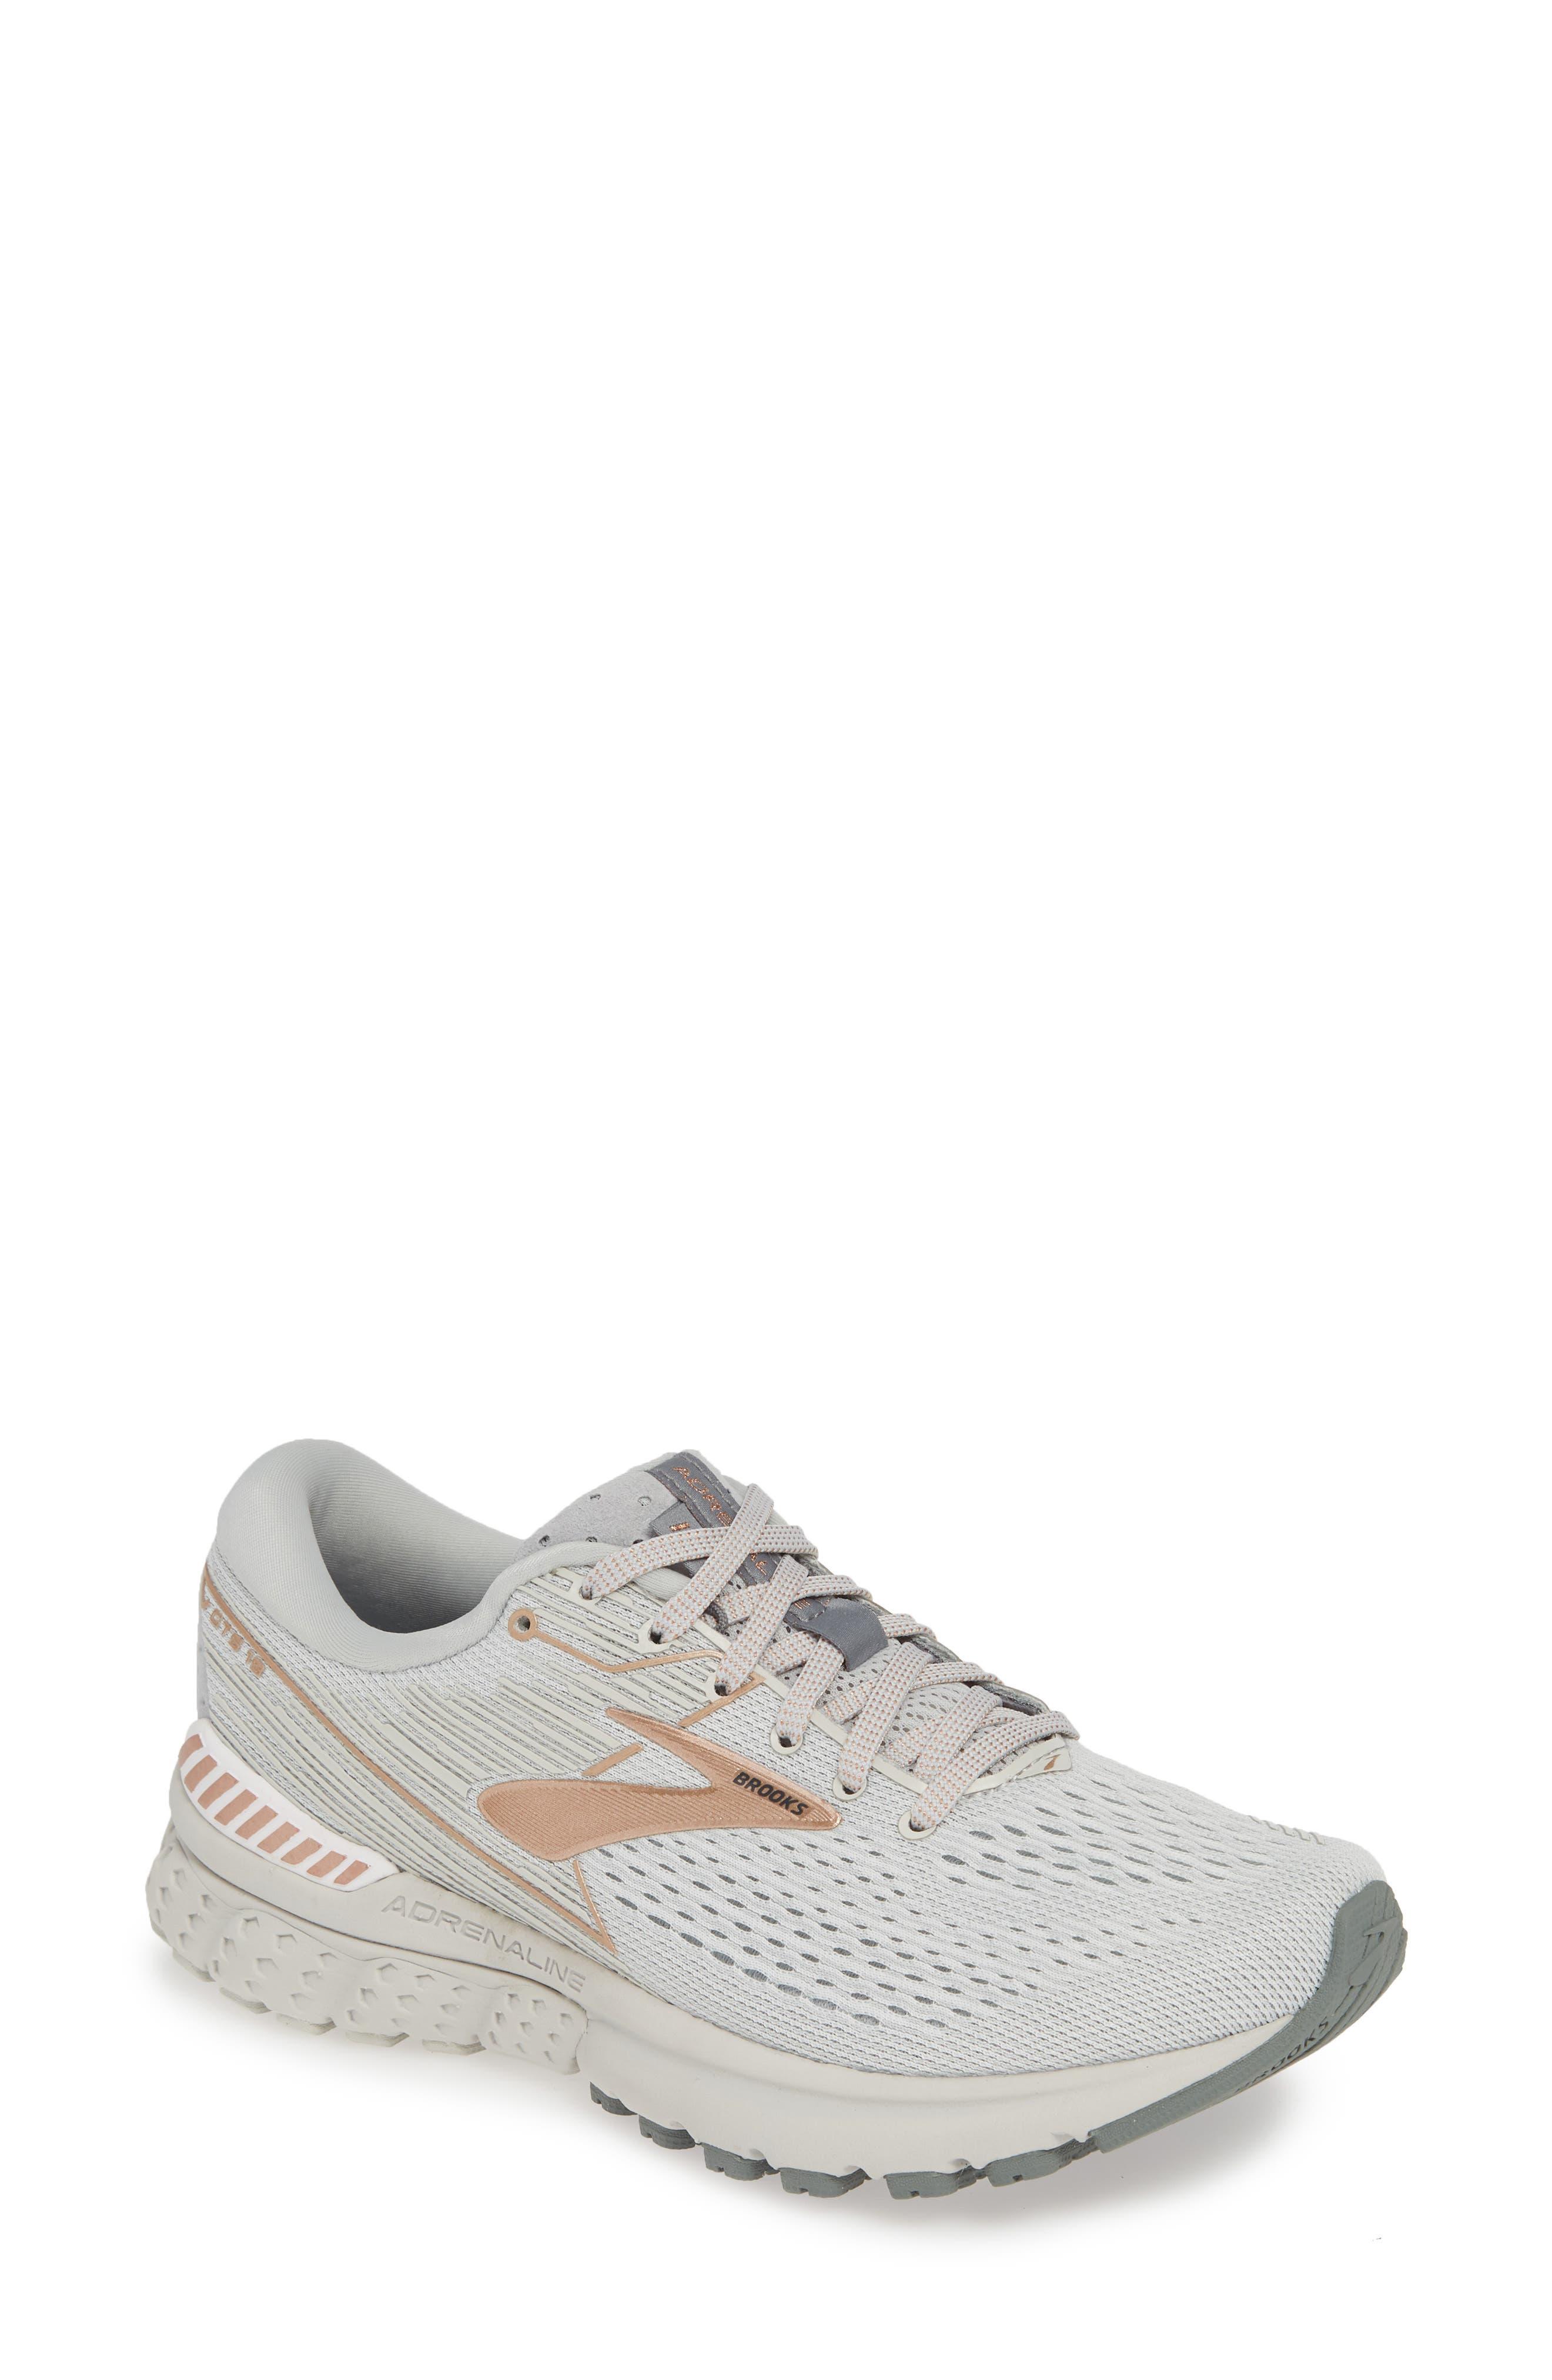 7f59ebbcccc Brooks Adrenaline Gts 19 Running Shoe B - Grey